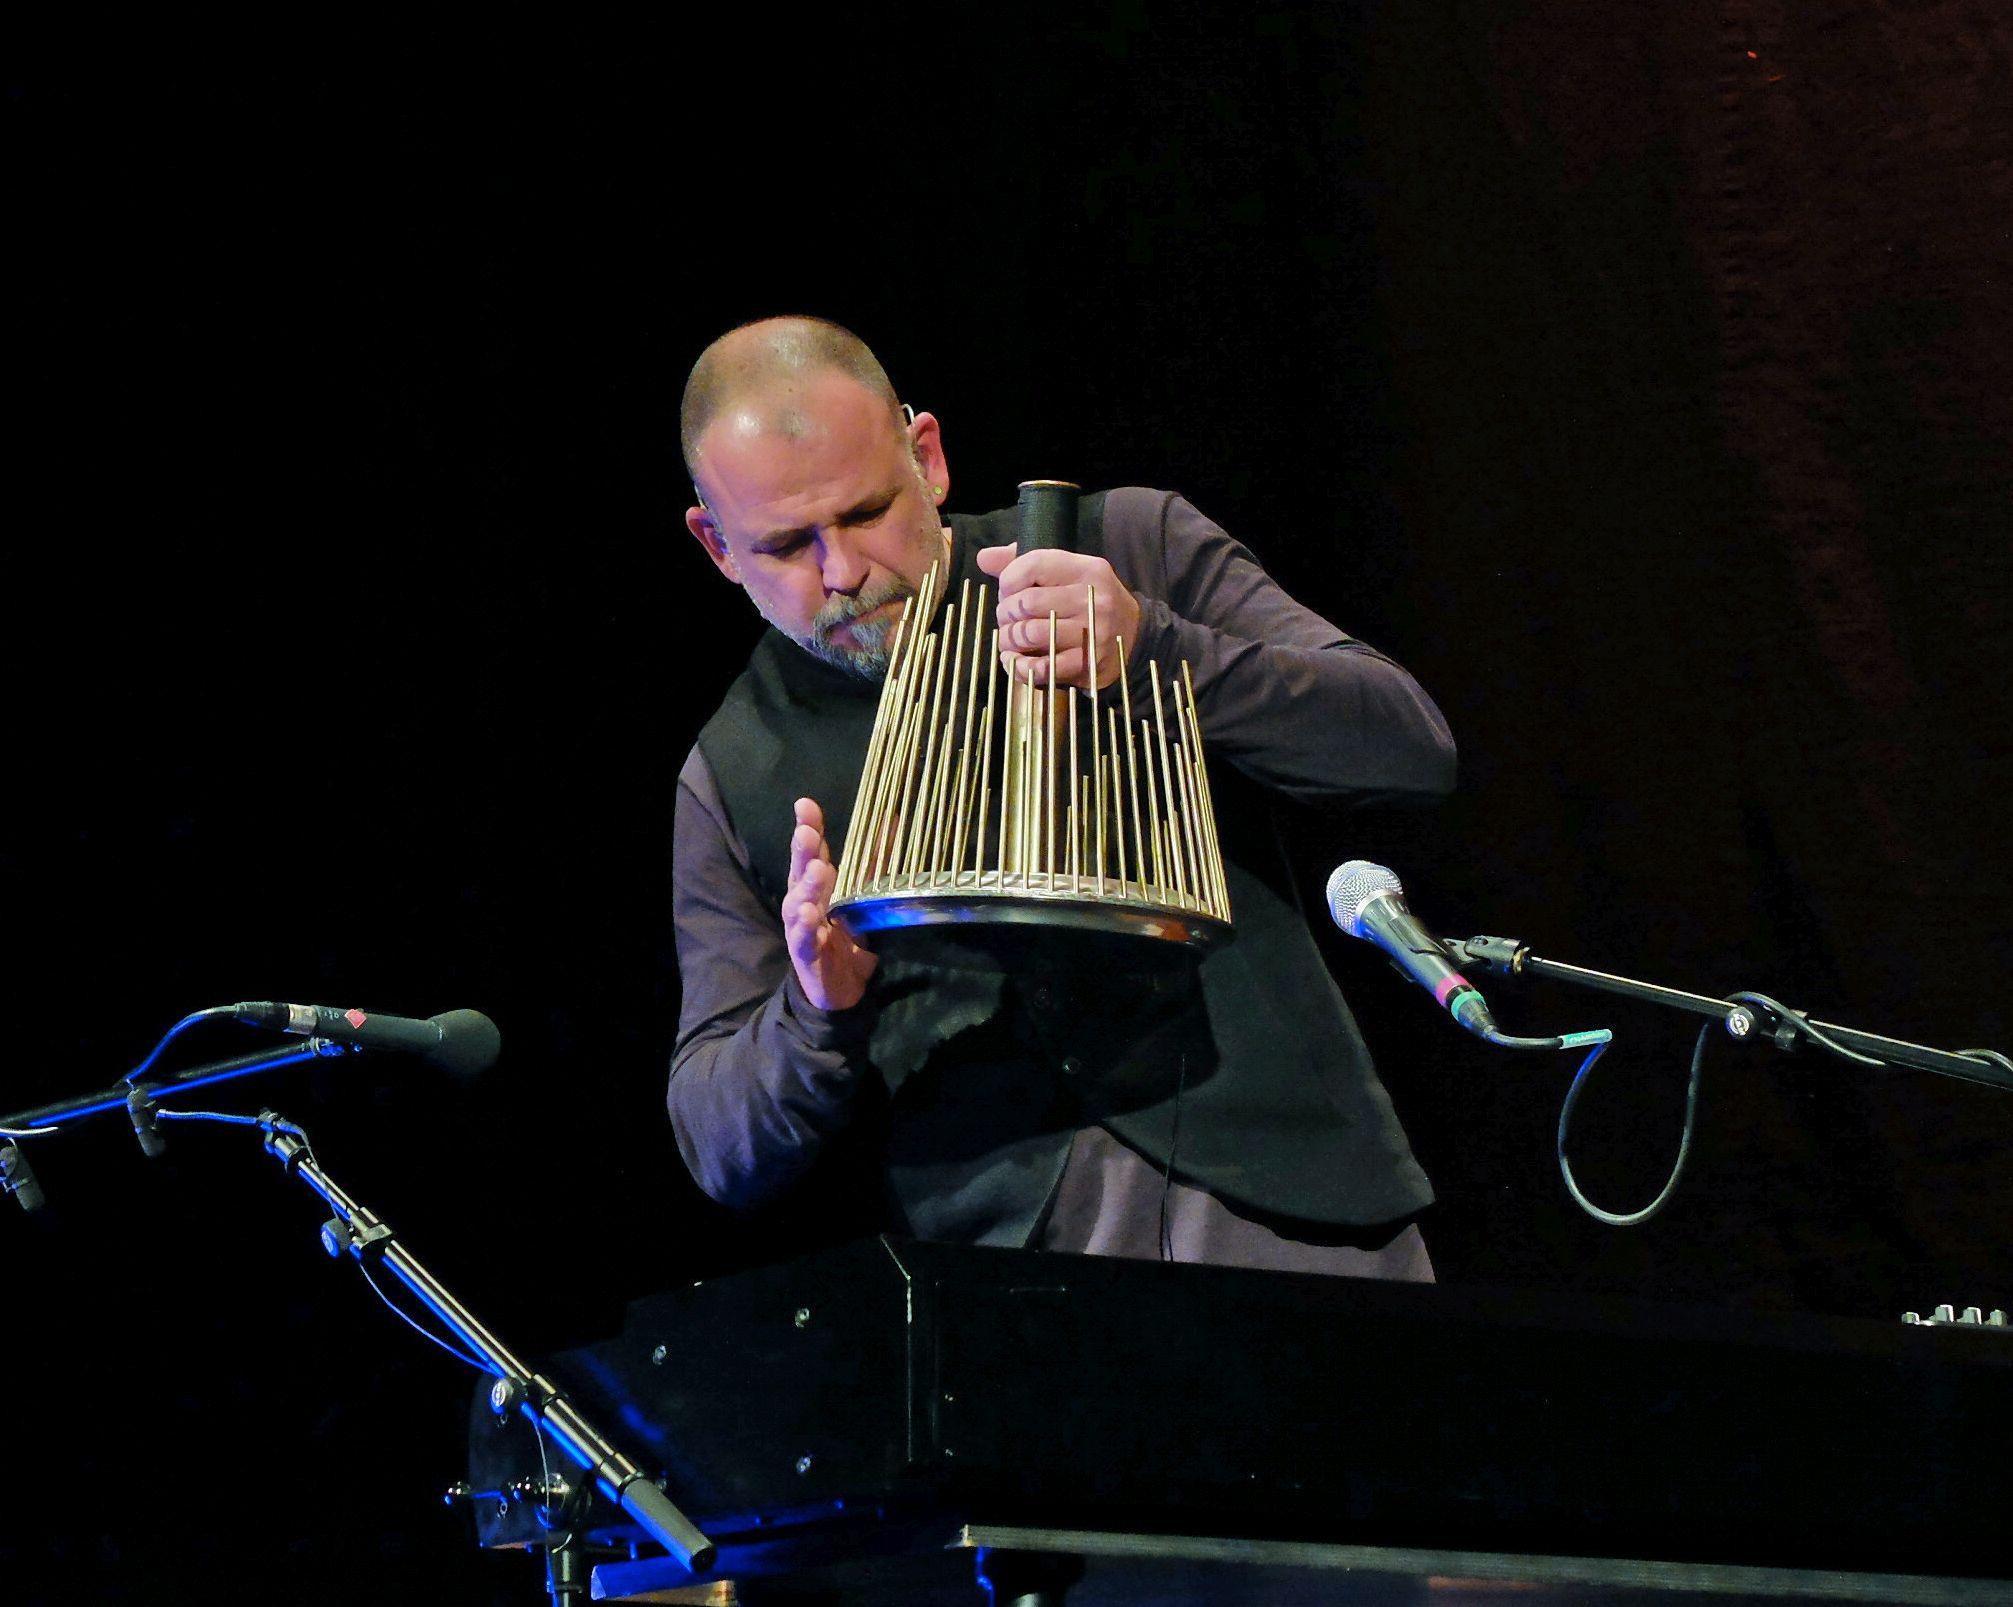 Martin Kälberer Baltasound Waterphone